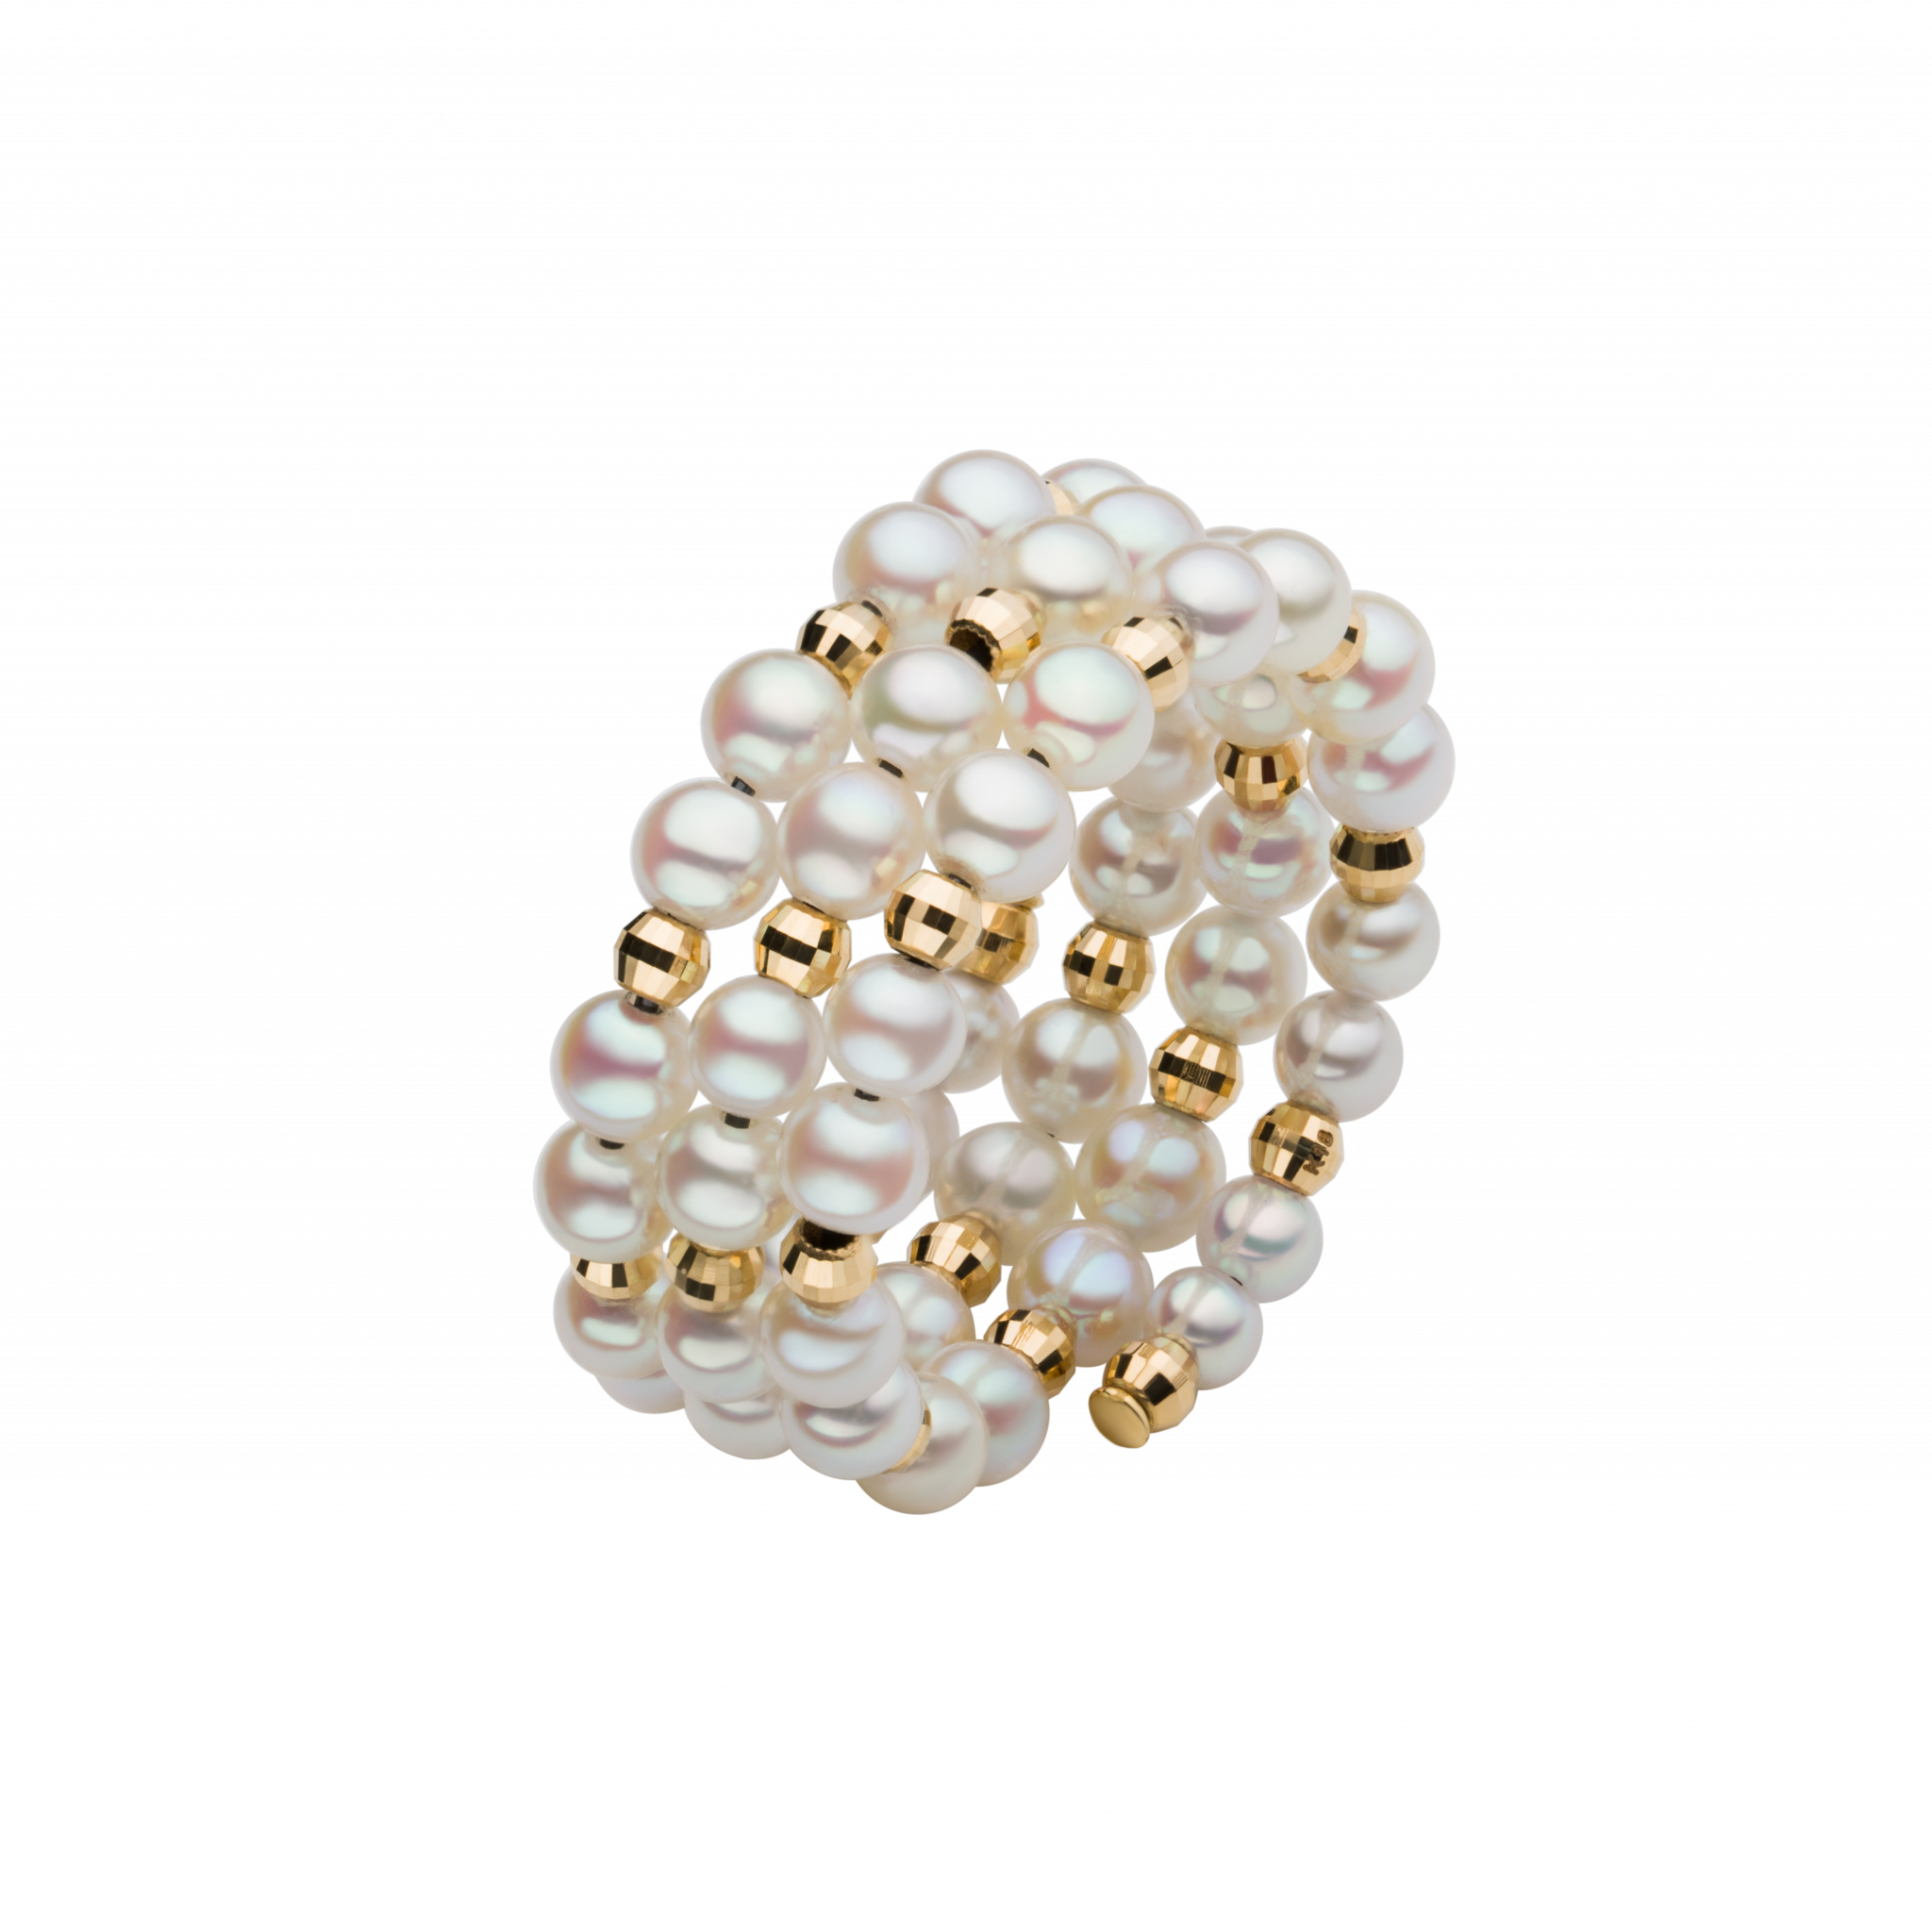 Spuma Collection 18K黄金Akoya珍珠 可调节戒指 6699